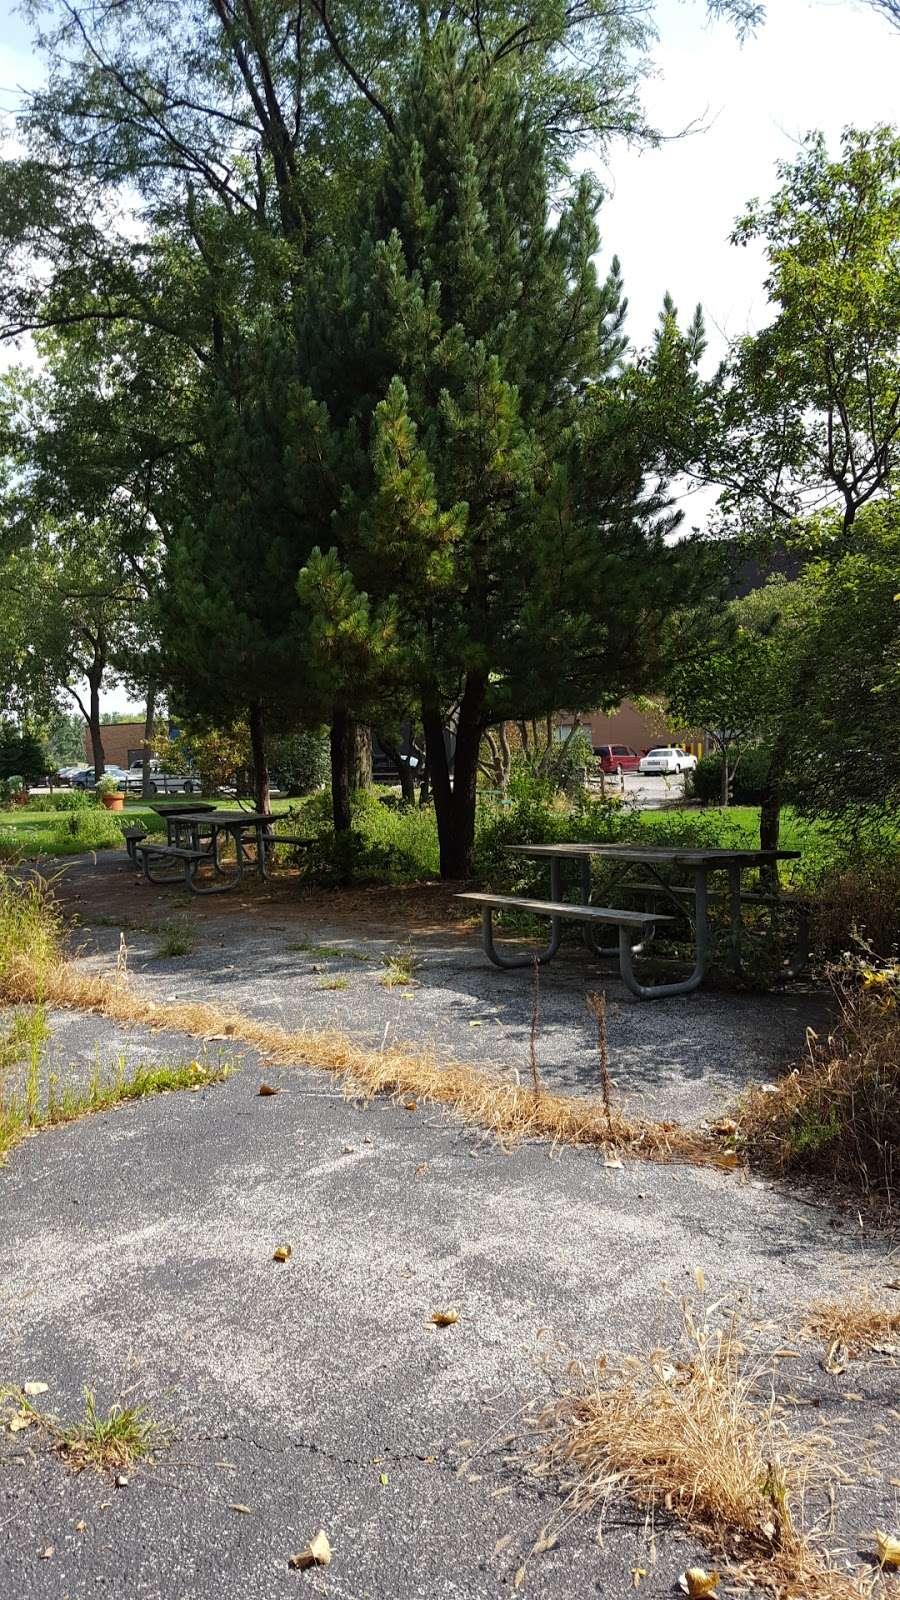 Triton College Botanical Garden - park  | Photo 5 of 10 | Address: 2000 5th Ave, River Grove, IL 60171, USA | Phone: (708) 456-0300